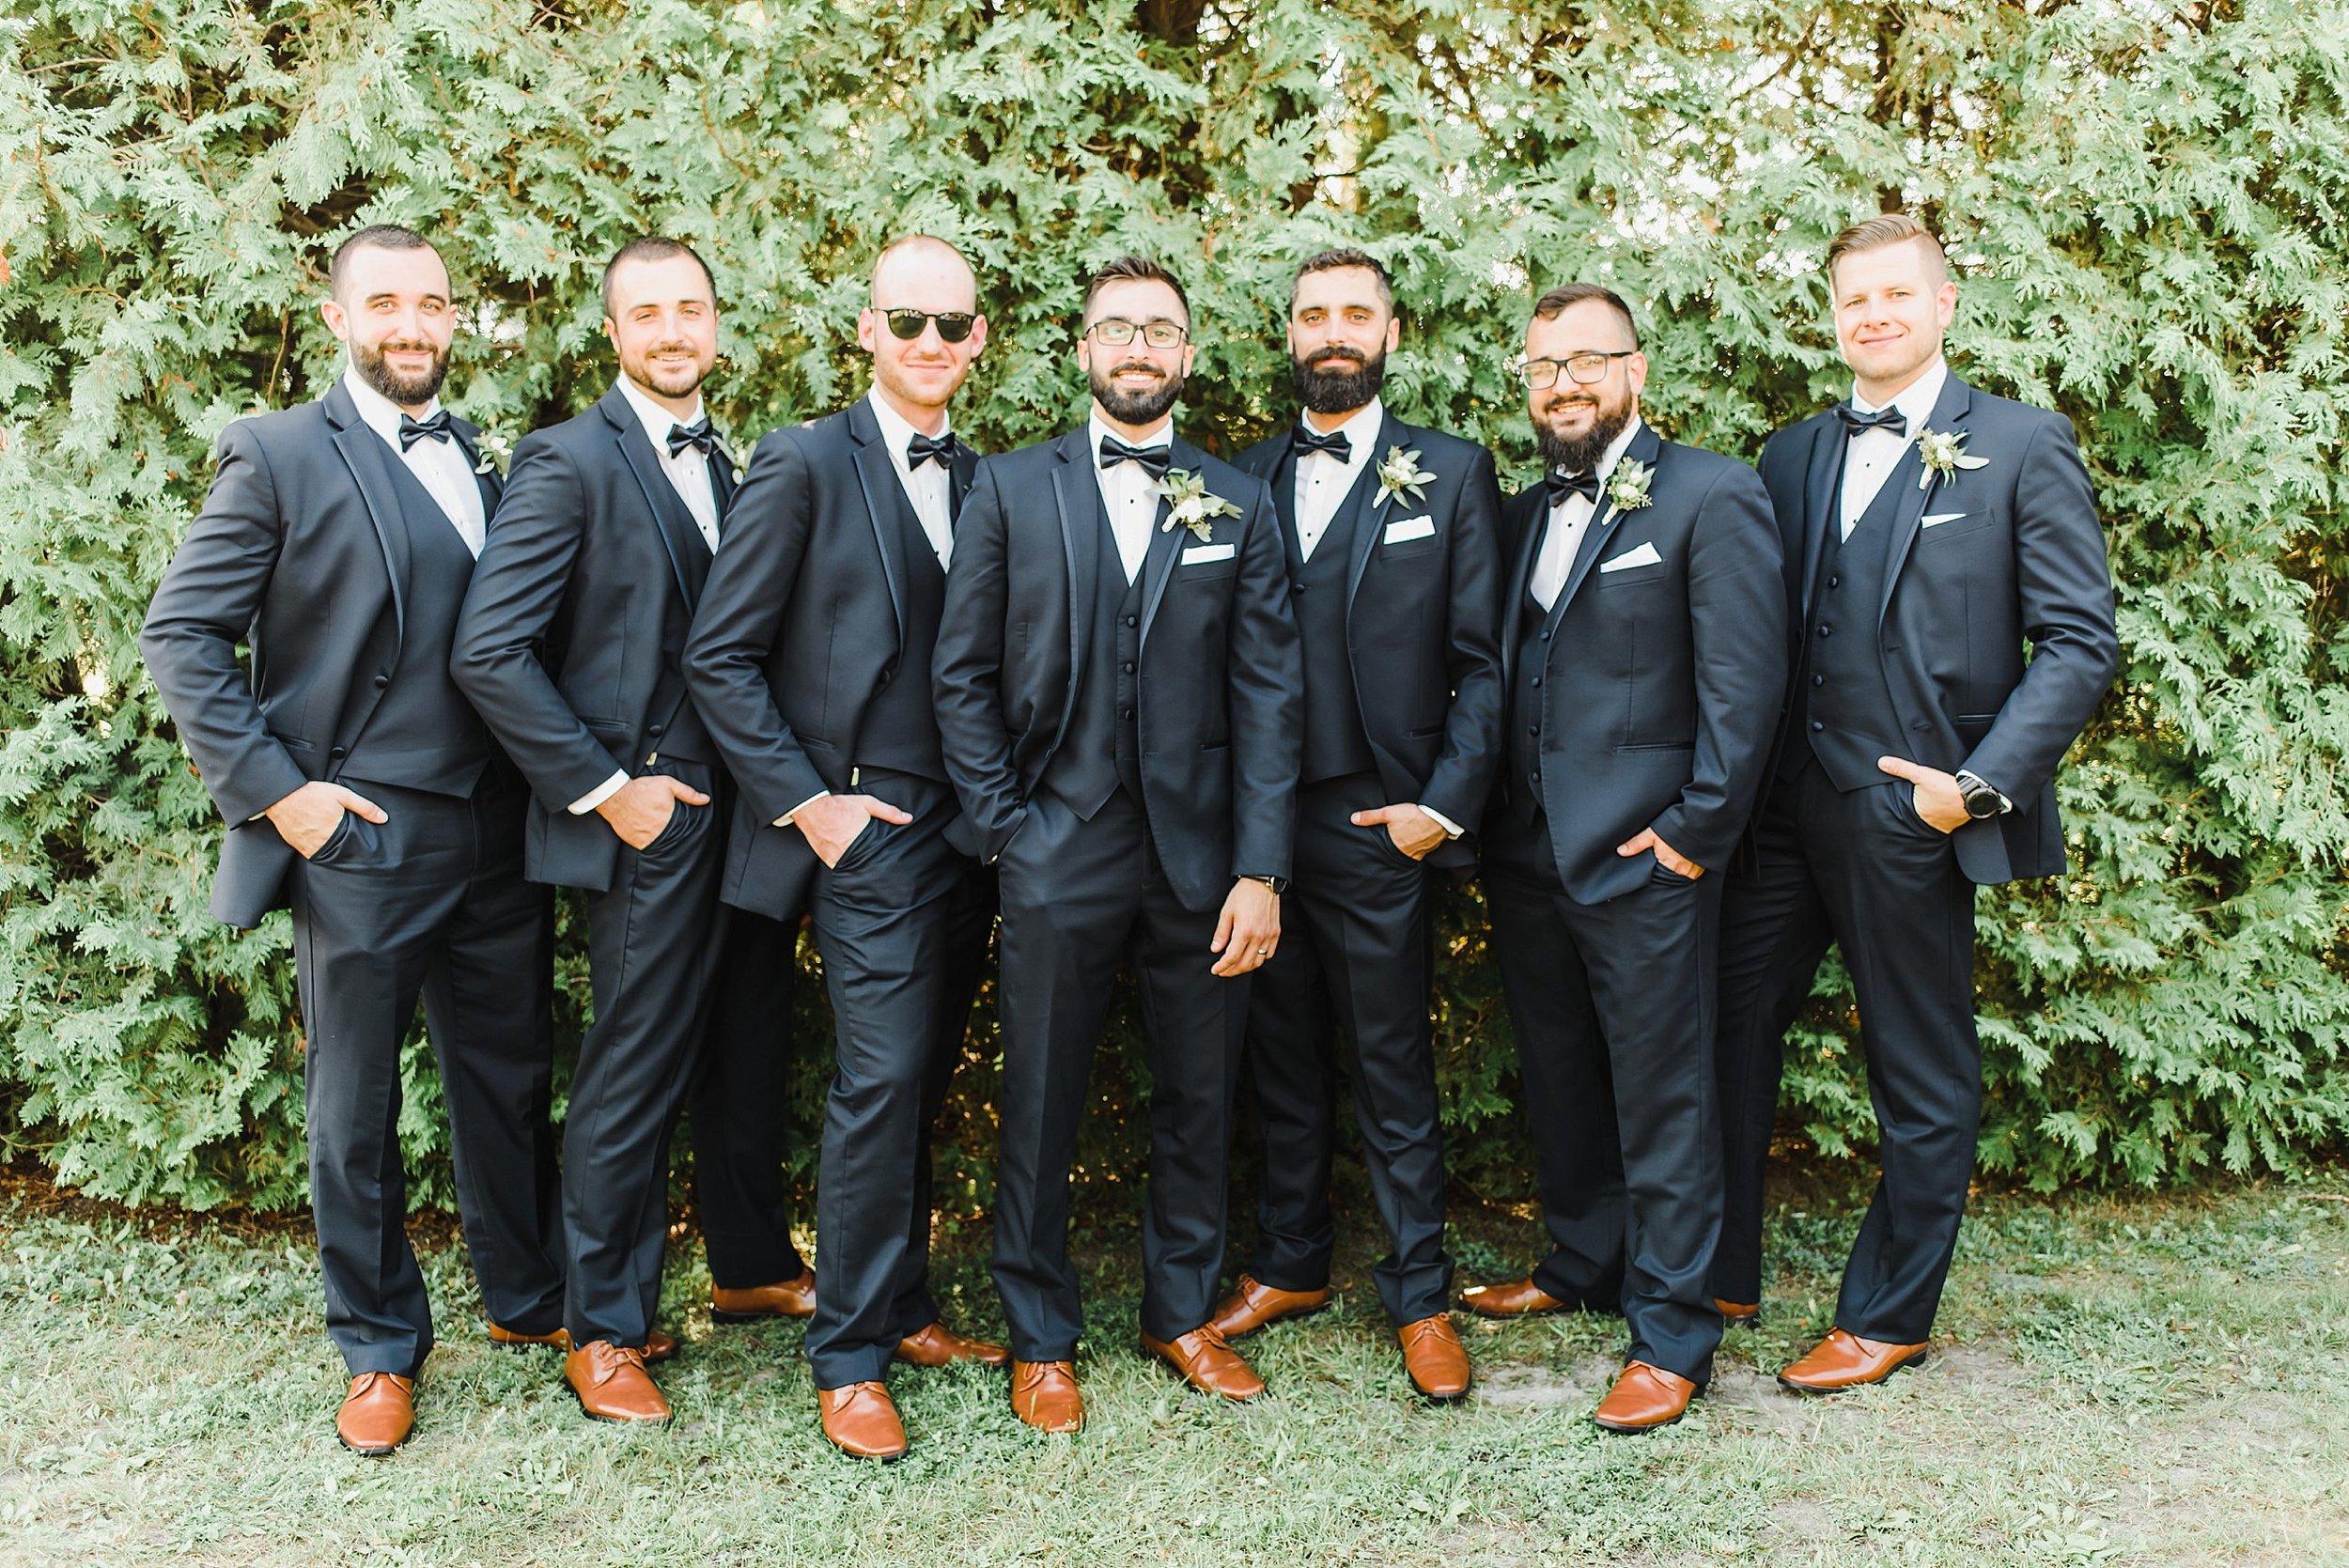 light airy indie fine art ottawa wedding photographer | Ali and Batoul Photography_1286.jpg